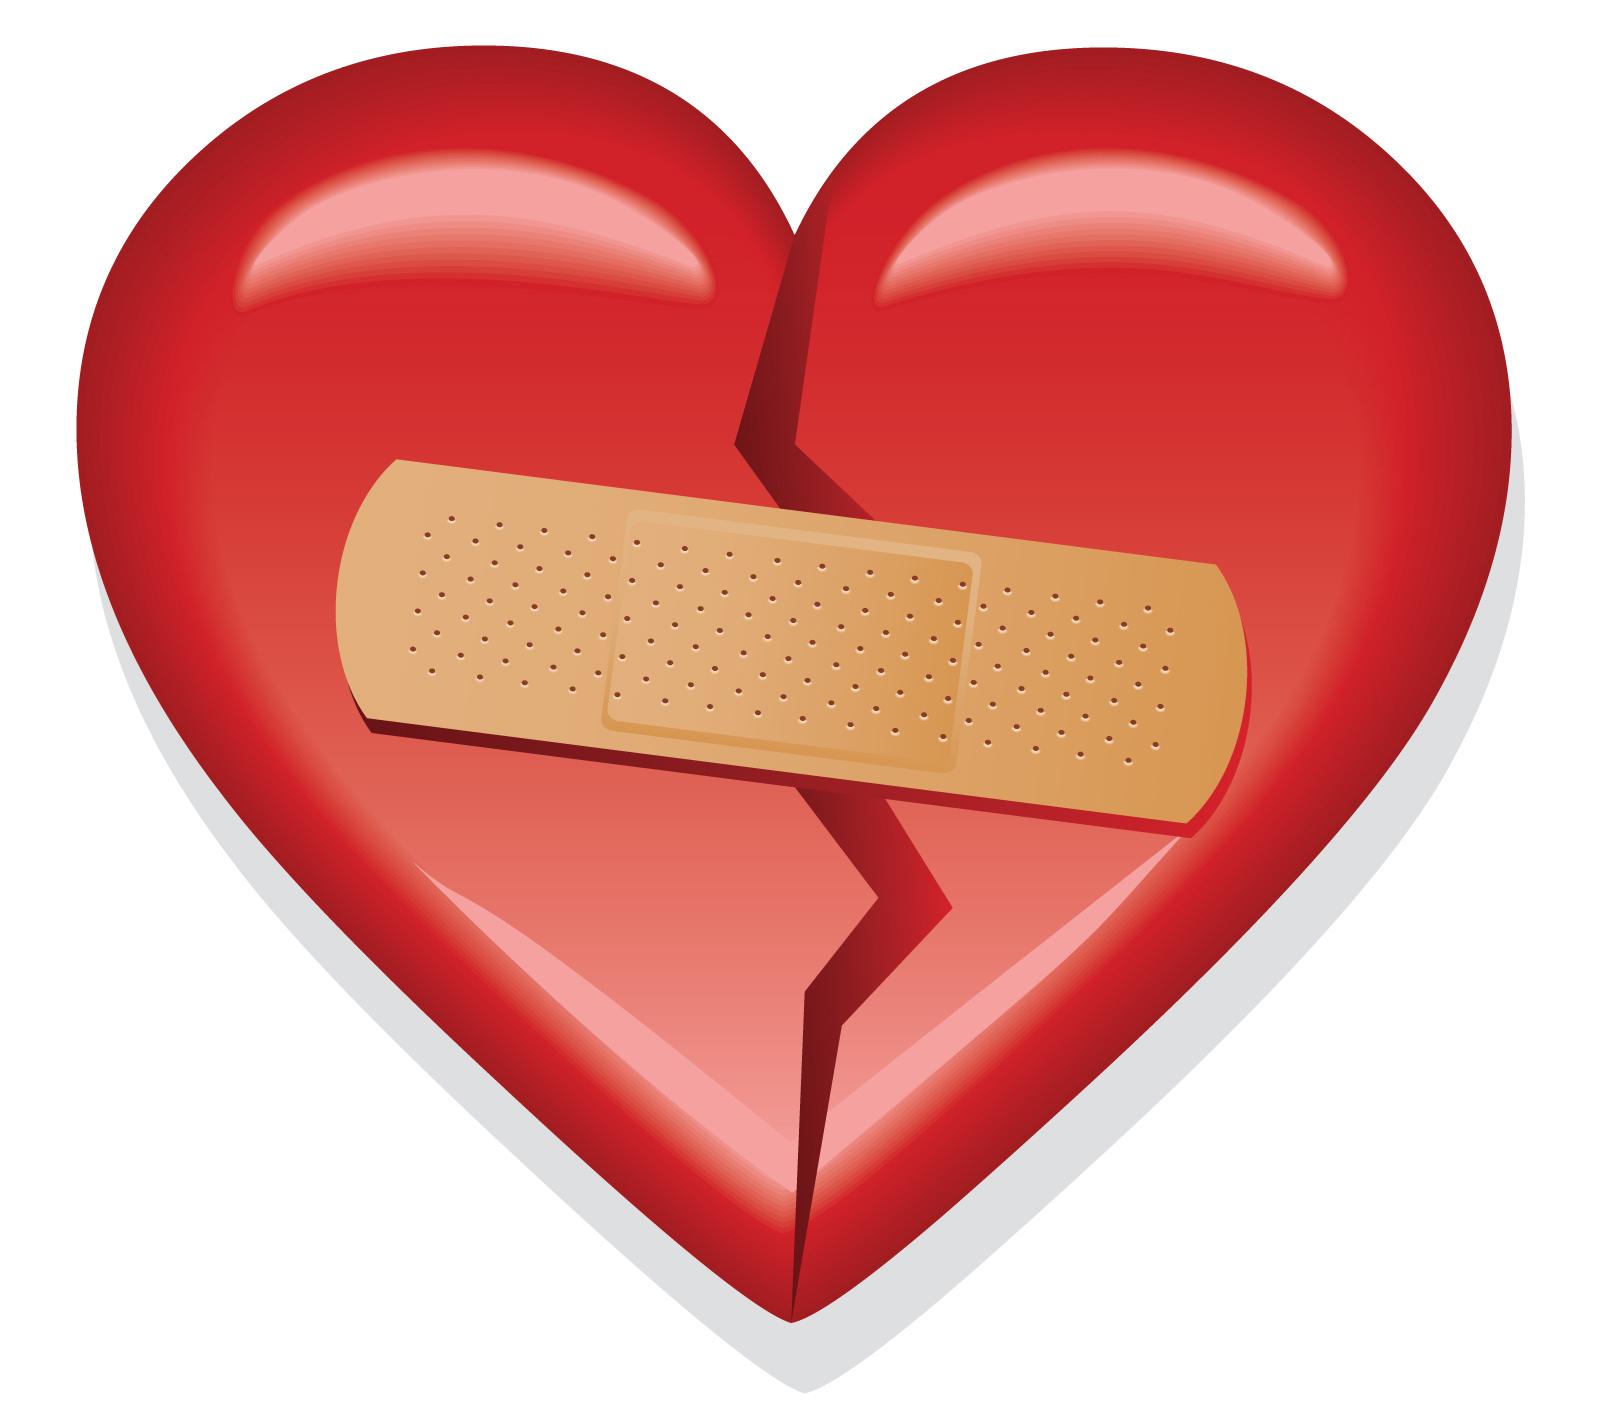 http://1.bp.blogspot.com/_3EQh7n2FUS4/TR0RPI9iNHI/AAAAAAAAG7g/K1AGfwhPWCk/s1600/1269850513_1600x1422_band-aid-heart-wallpaper.jpg